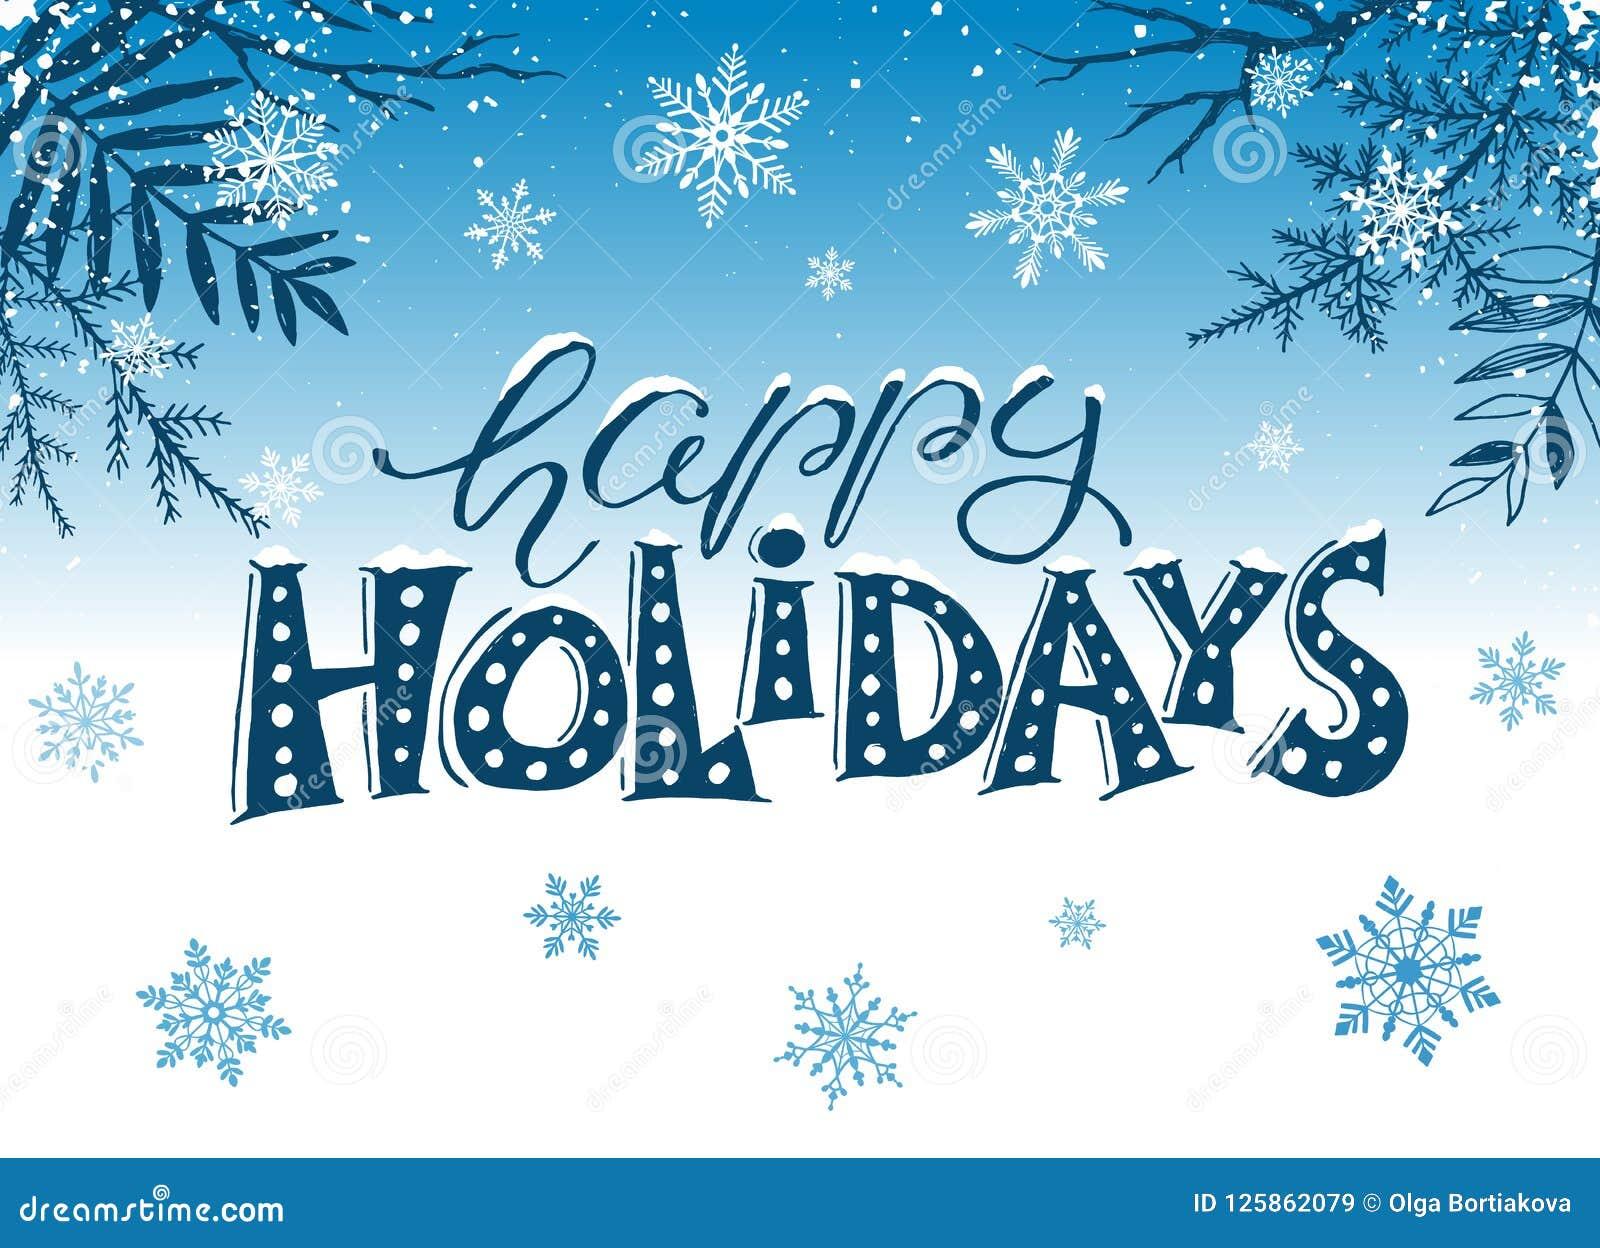 Happy Holidays Greeting Card Stock Vector Illustration Of Greeting Festa 125862079